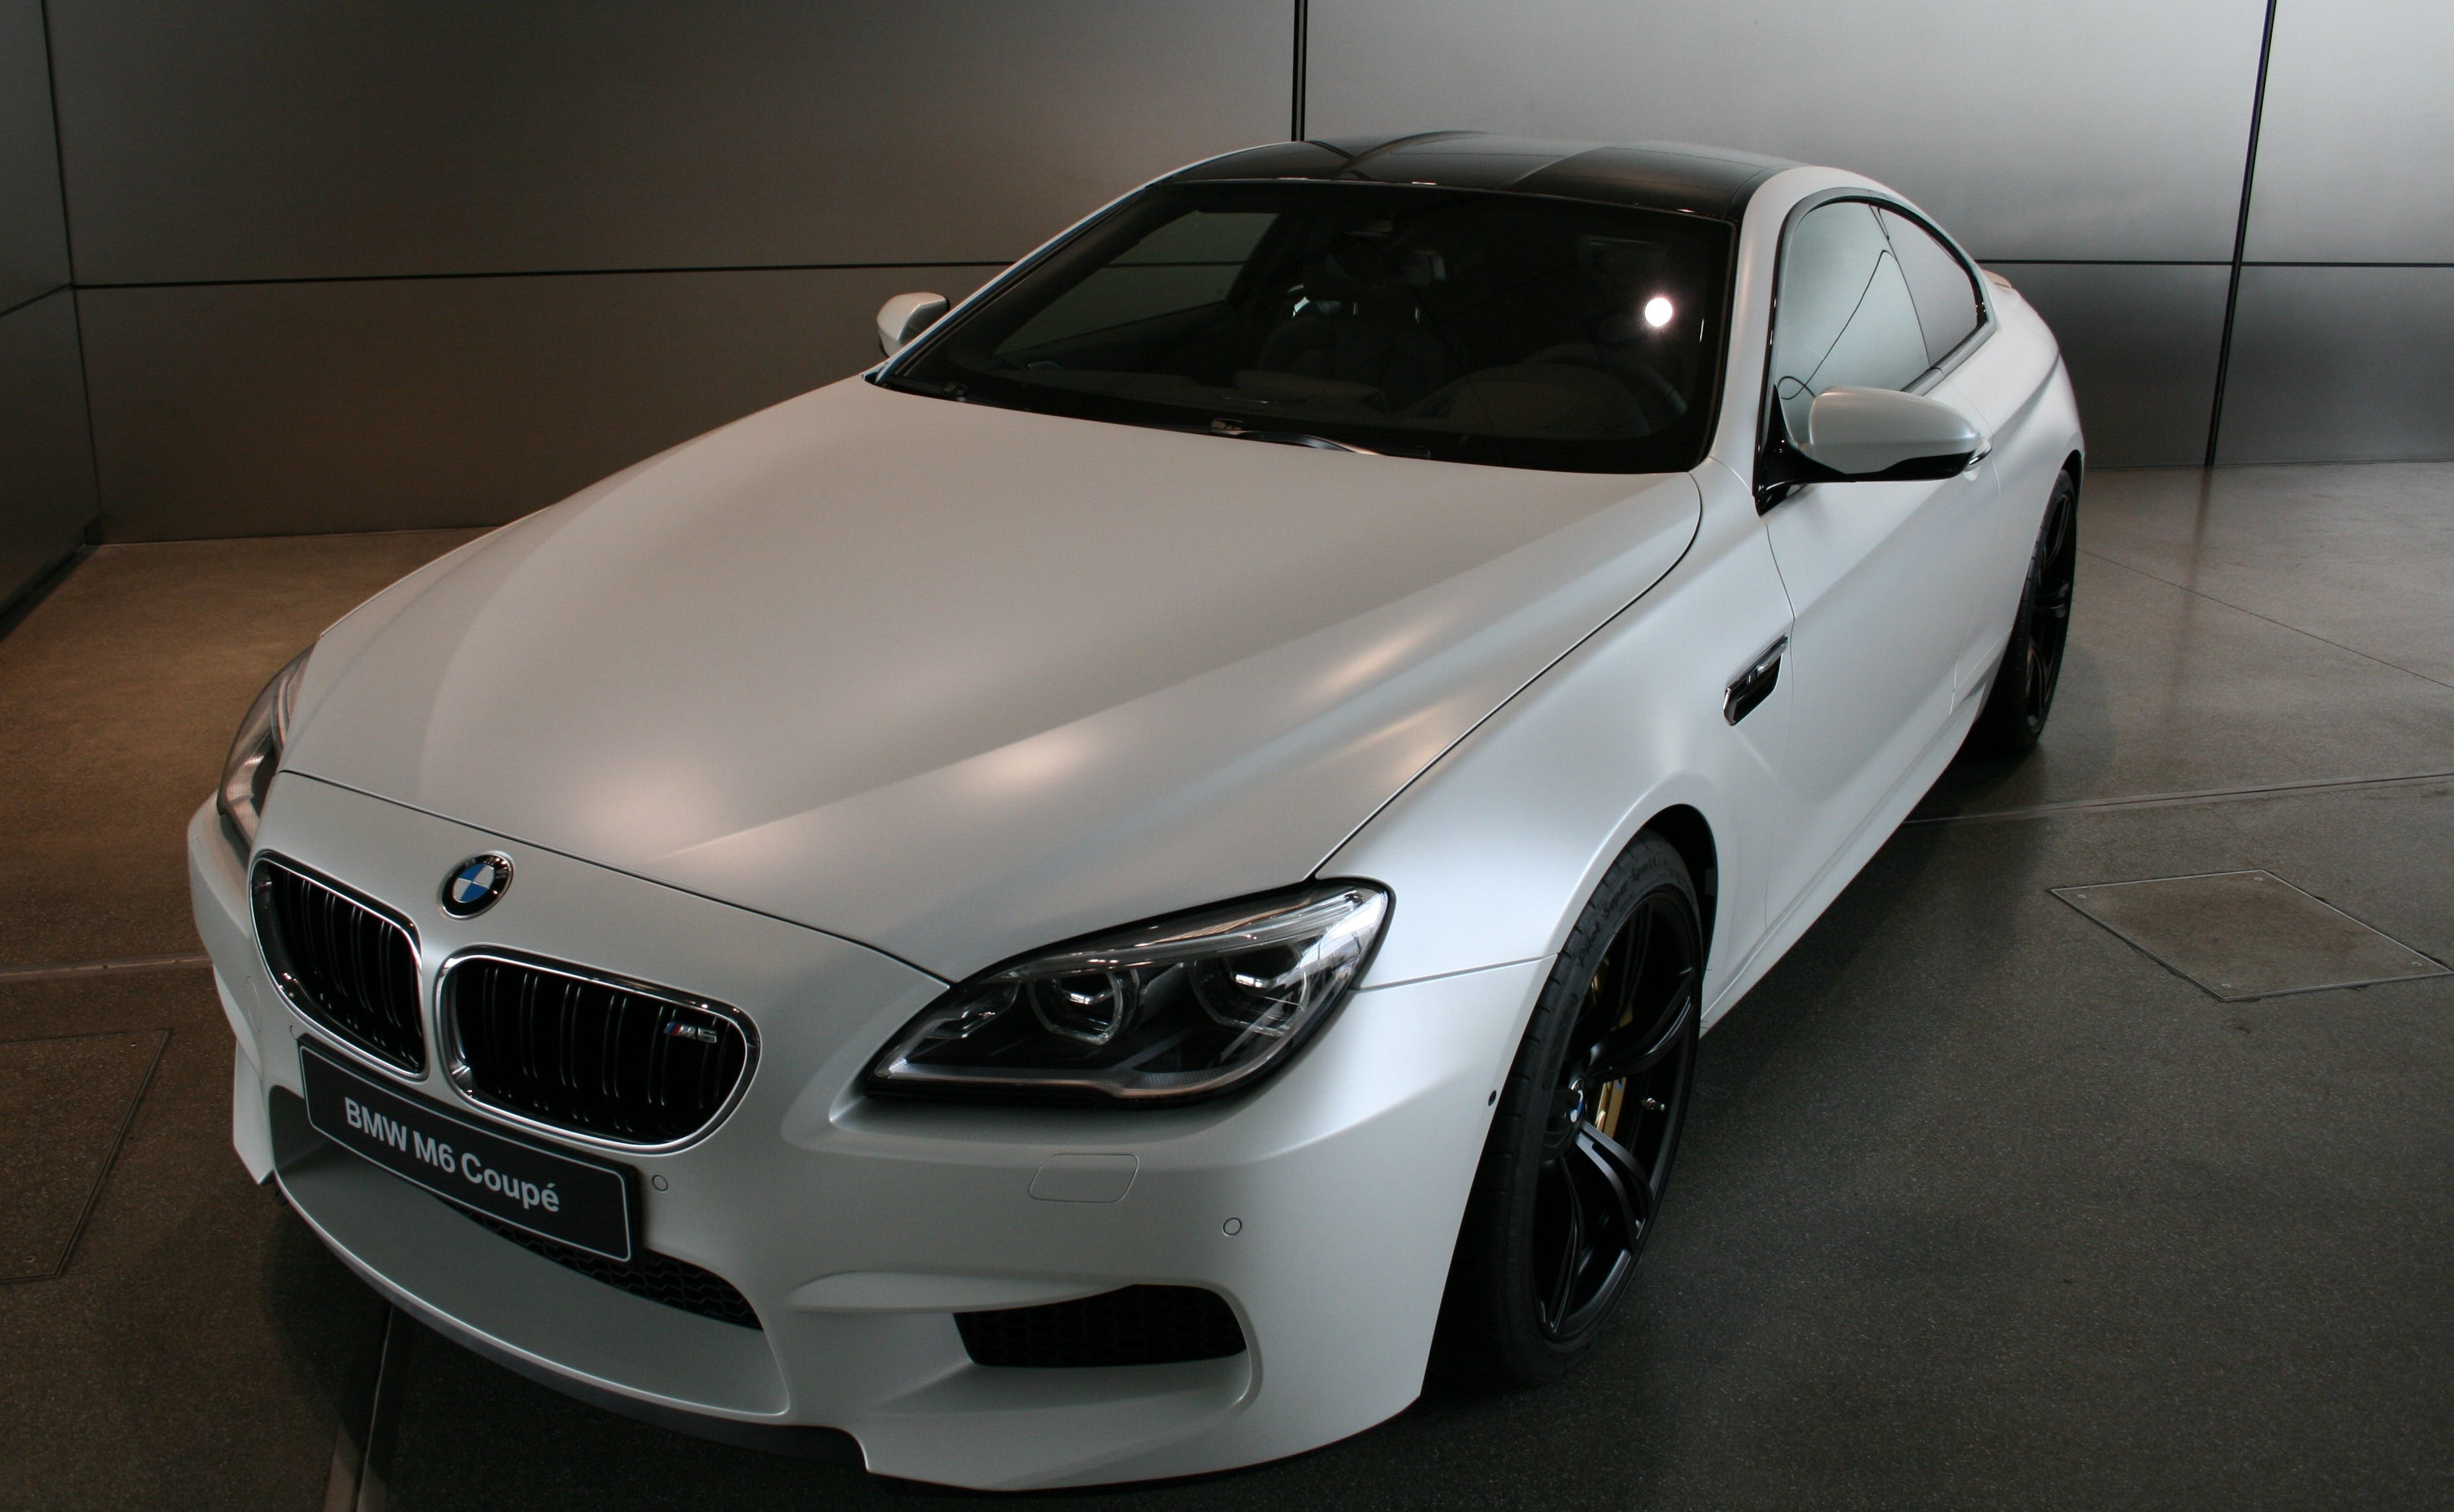 Free stock photo of model, car, vehicle, technology